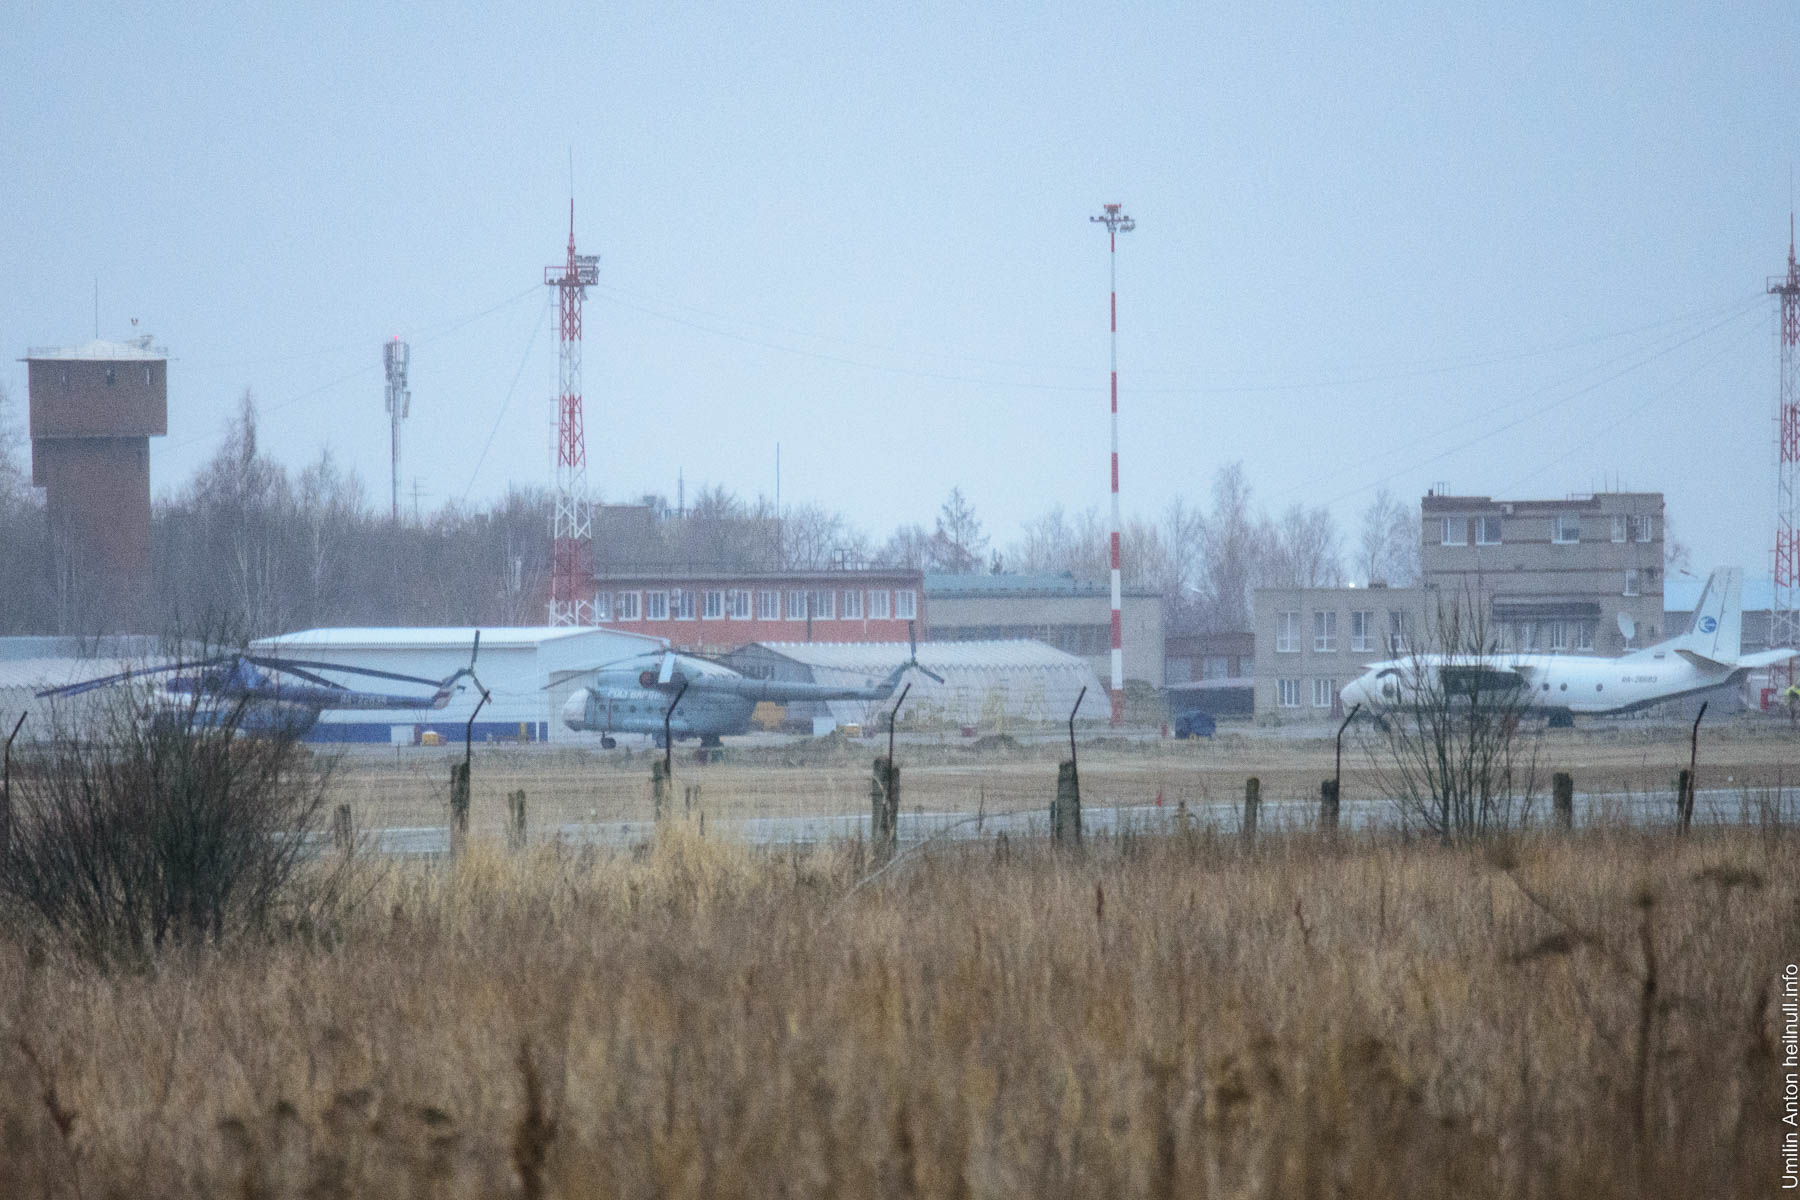 UAY_4604-9